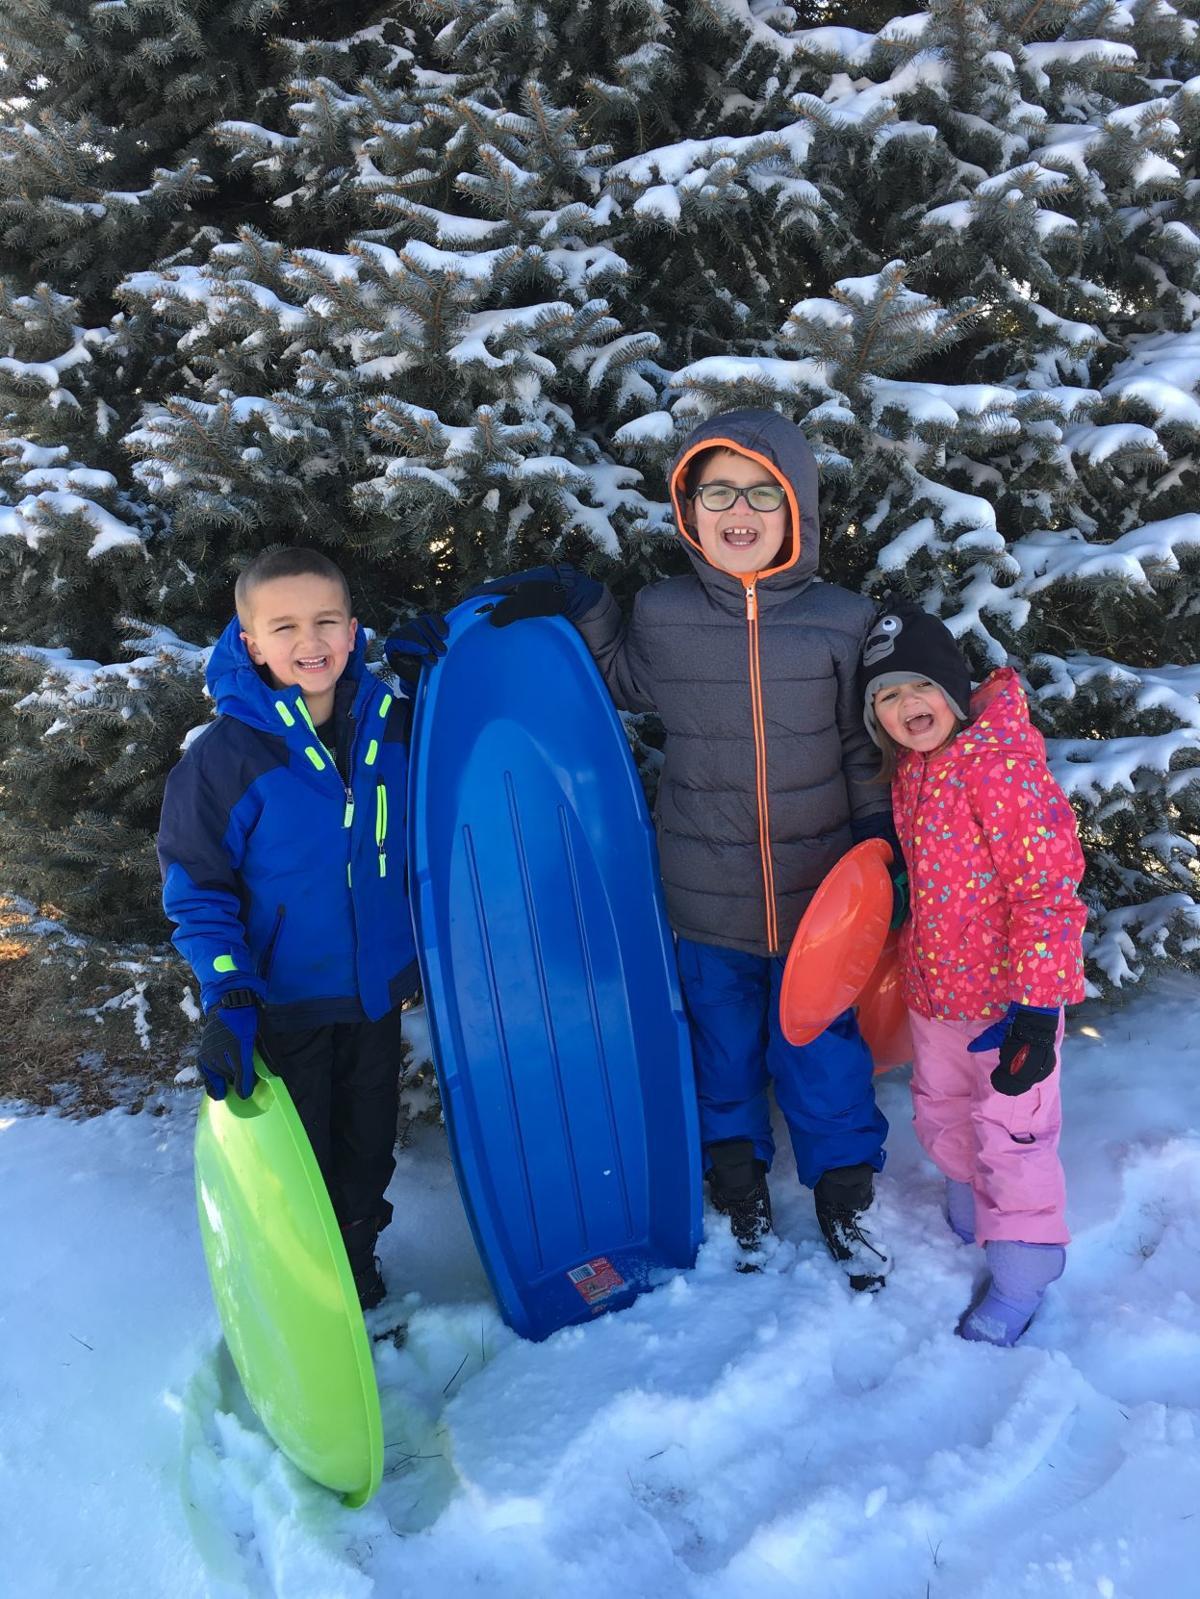 The Durban kids in snow